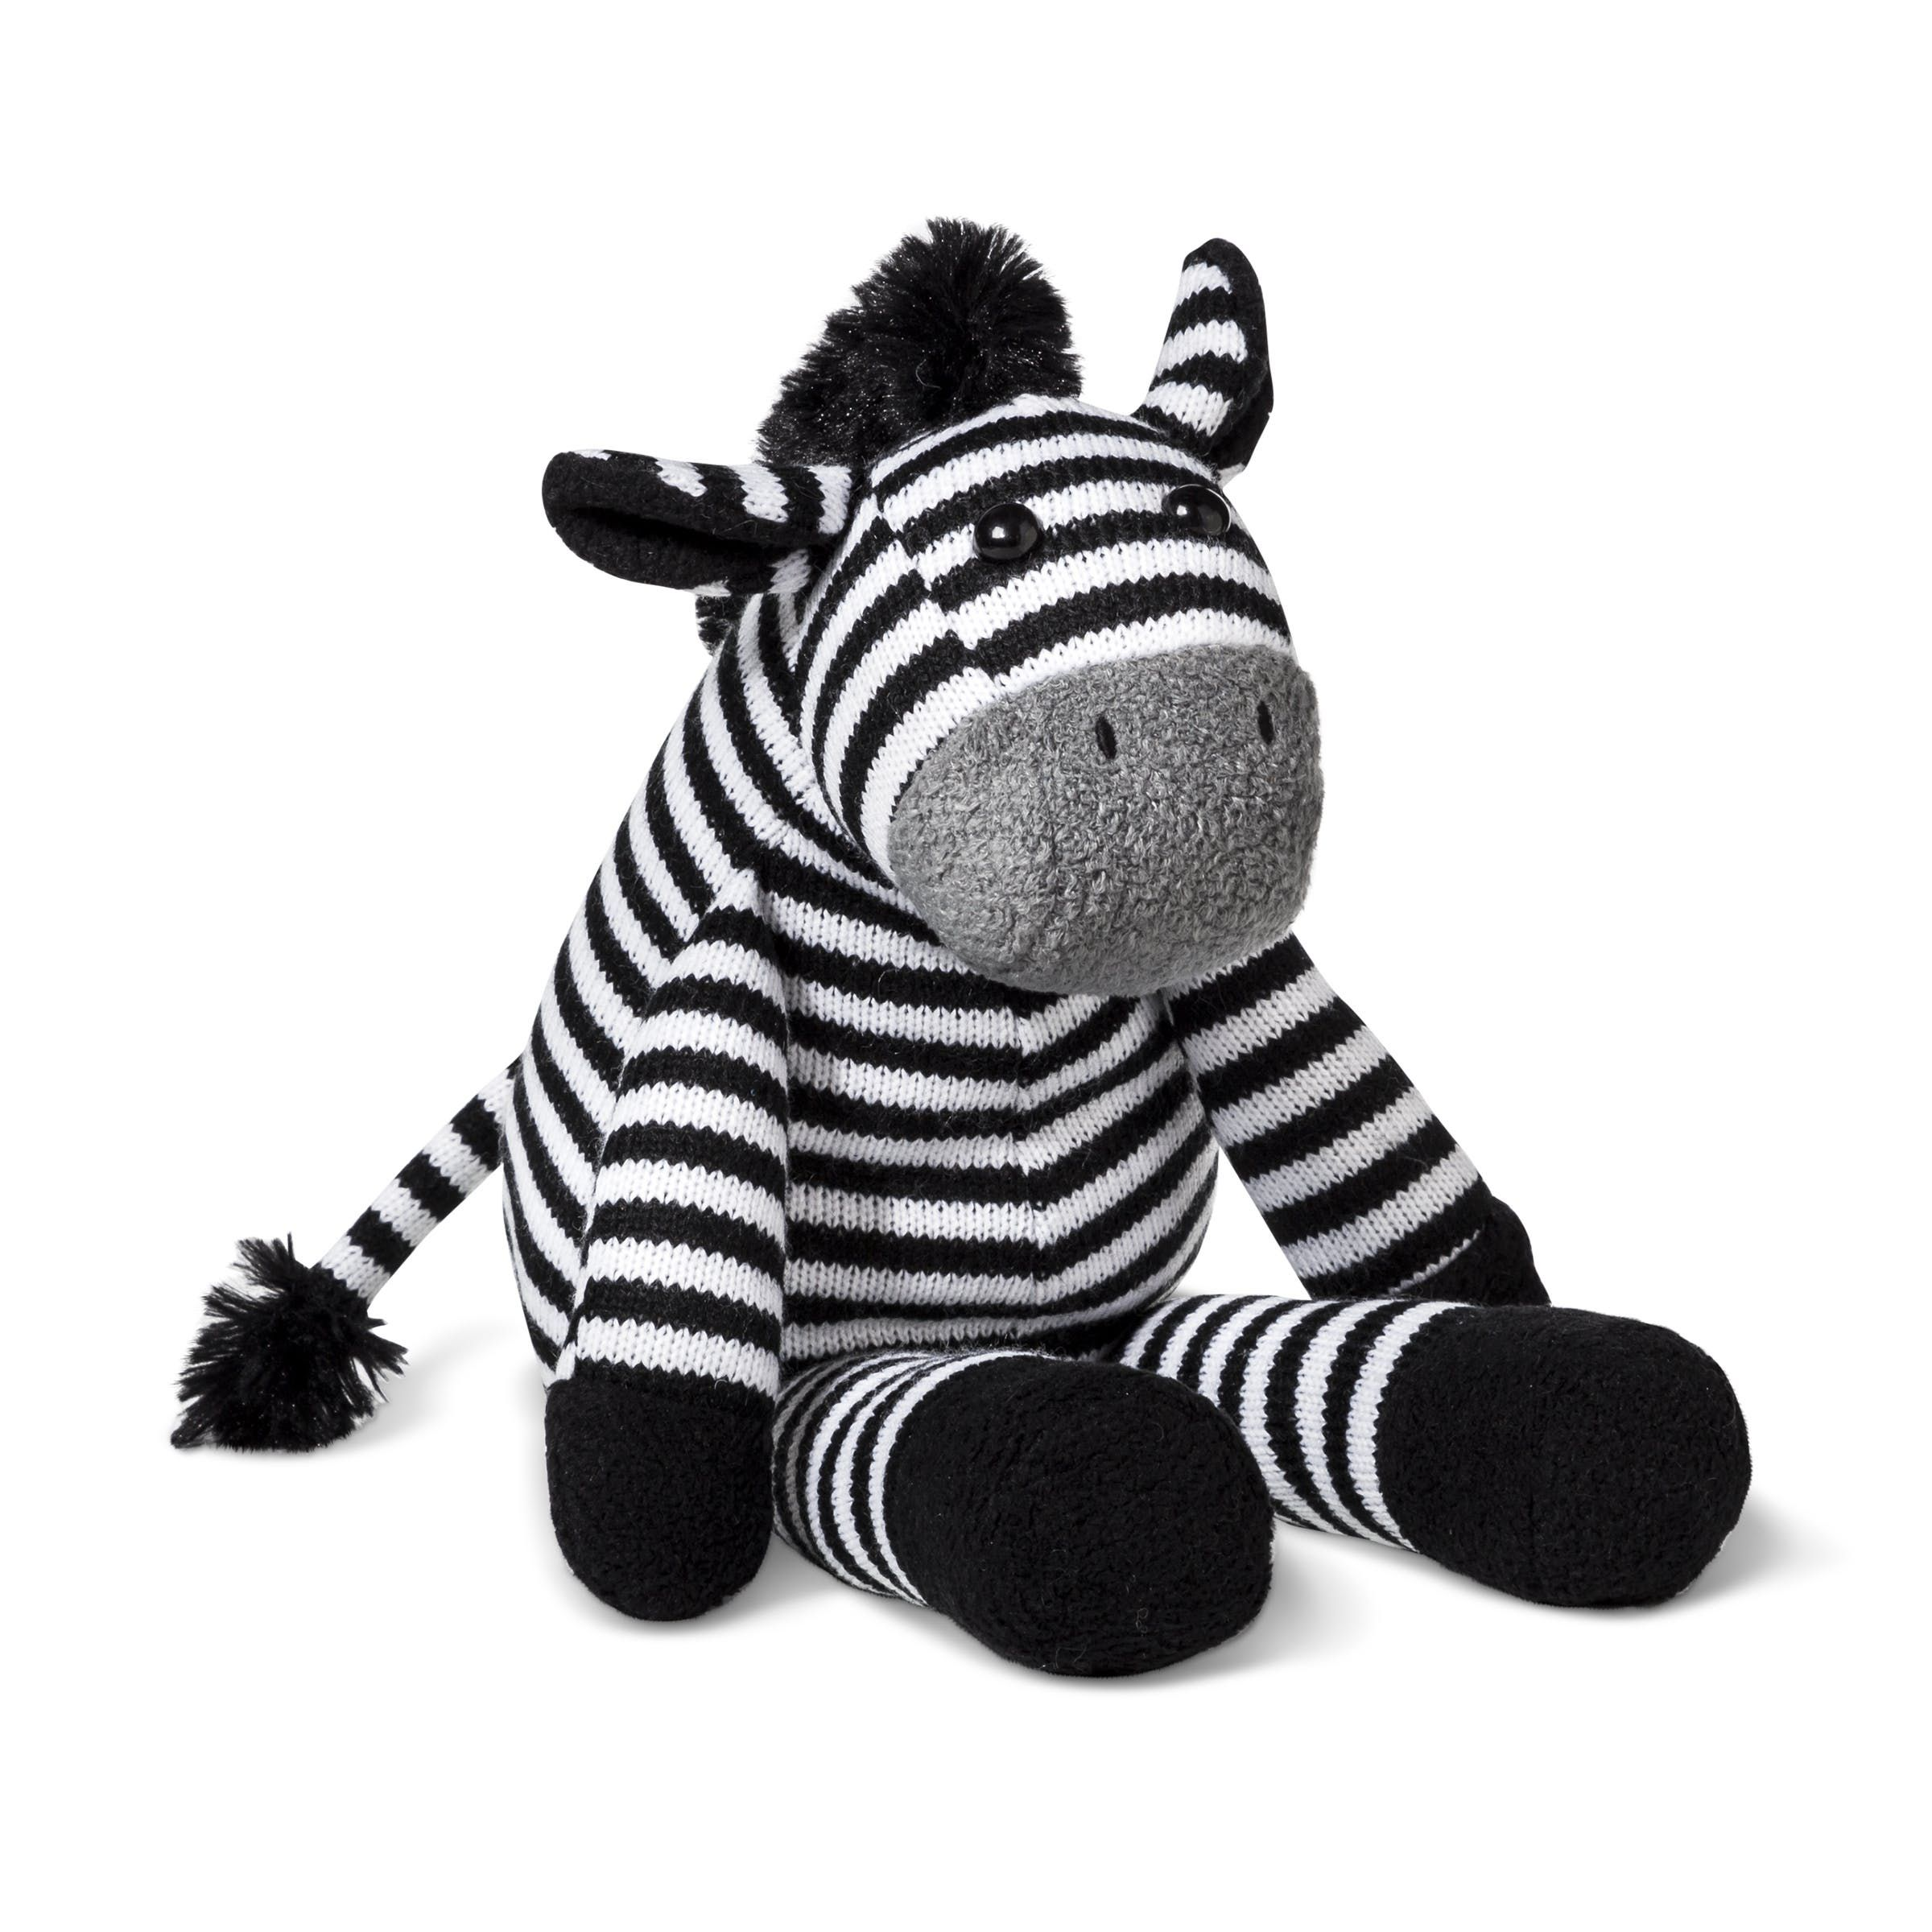 Cloud Island Plush Zebra, $14.99